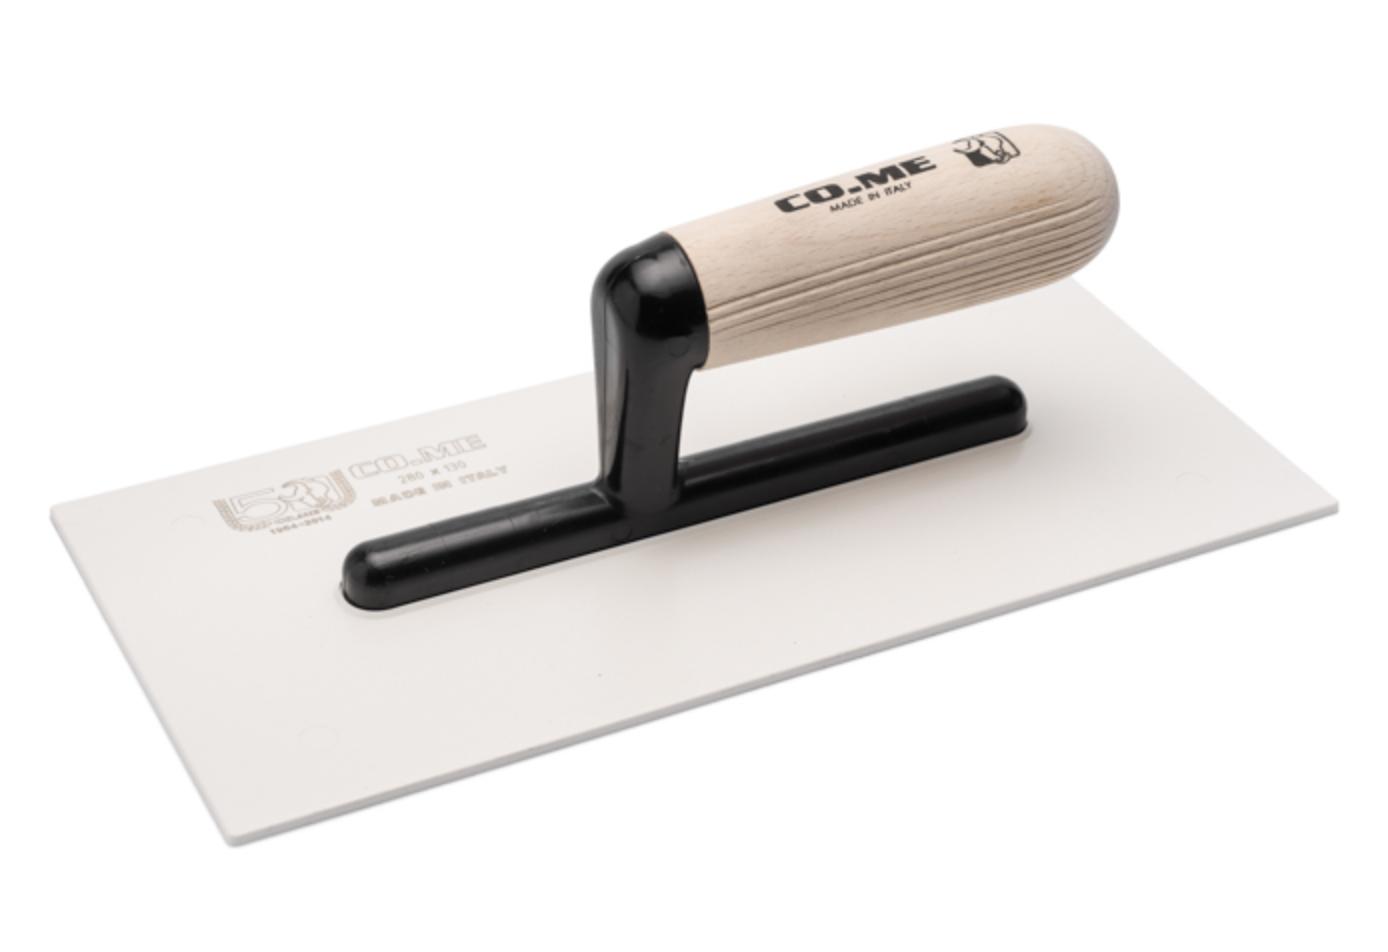 330-PVC/ABS trowel wood handle (non-bevel edge) 020